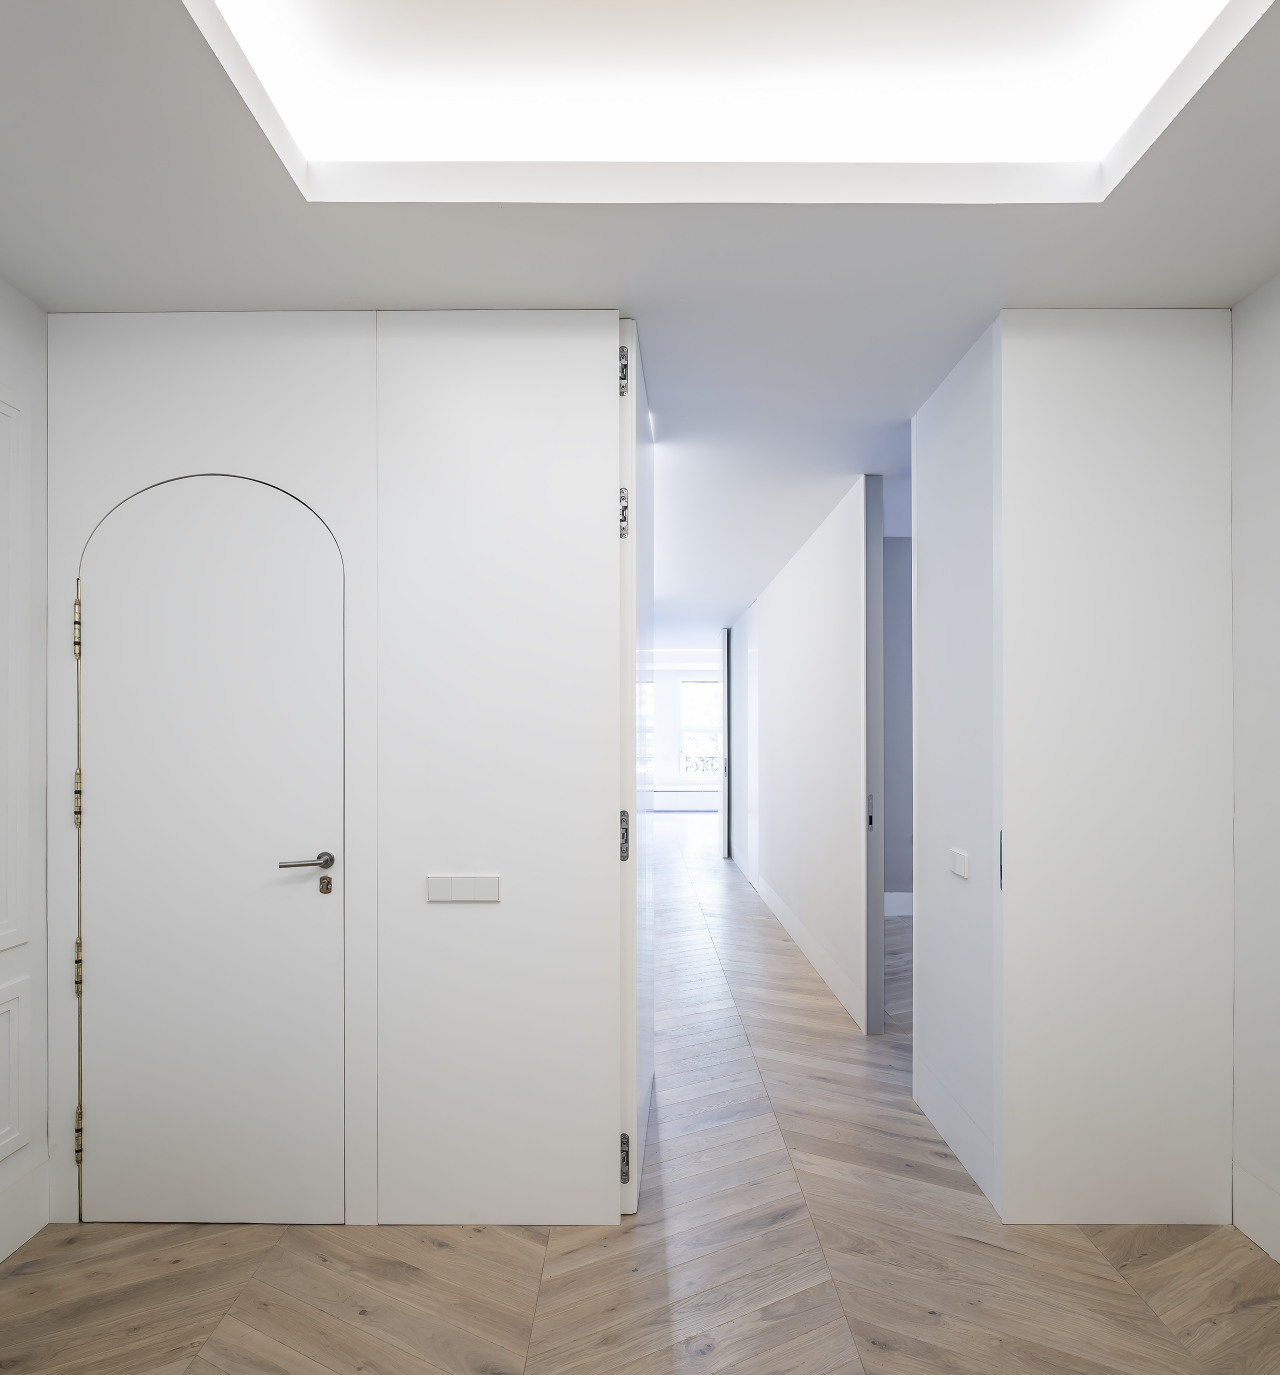 fotografia-arquitectura-valencia-german-cabo-gallardo-llopis-bfm-edificatoria-turia01 (10)